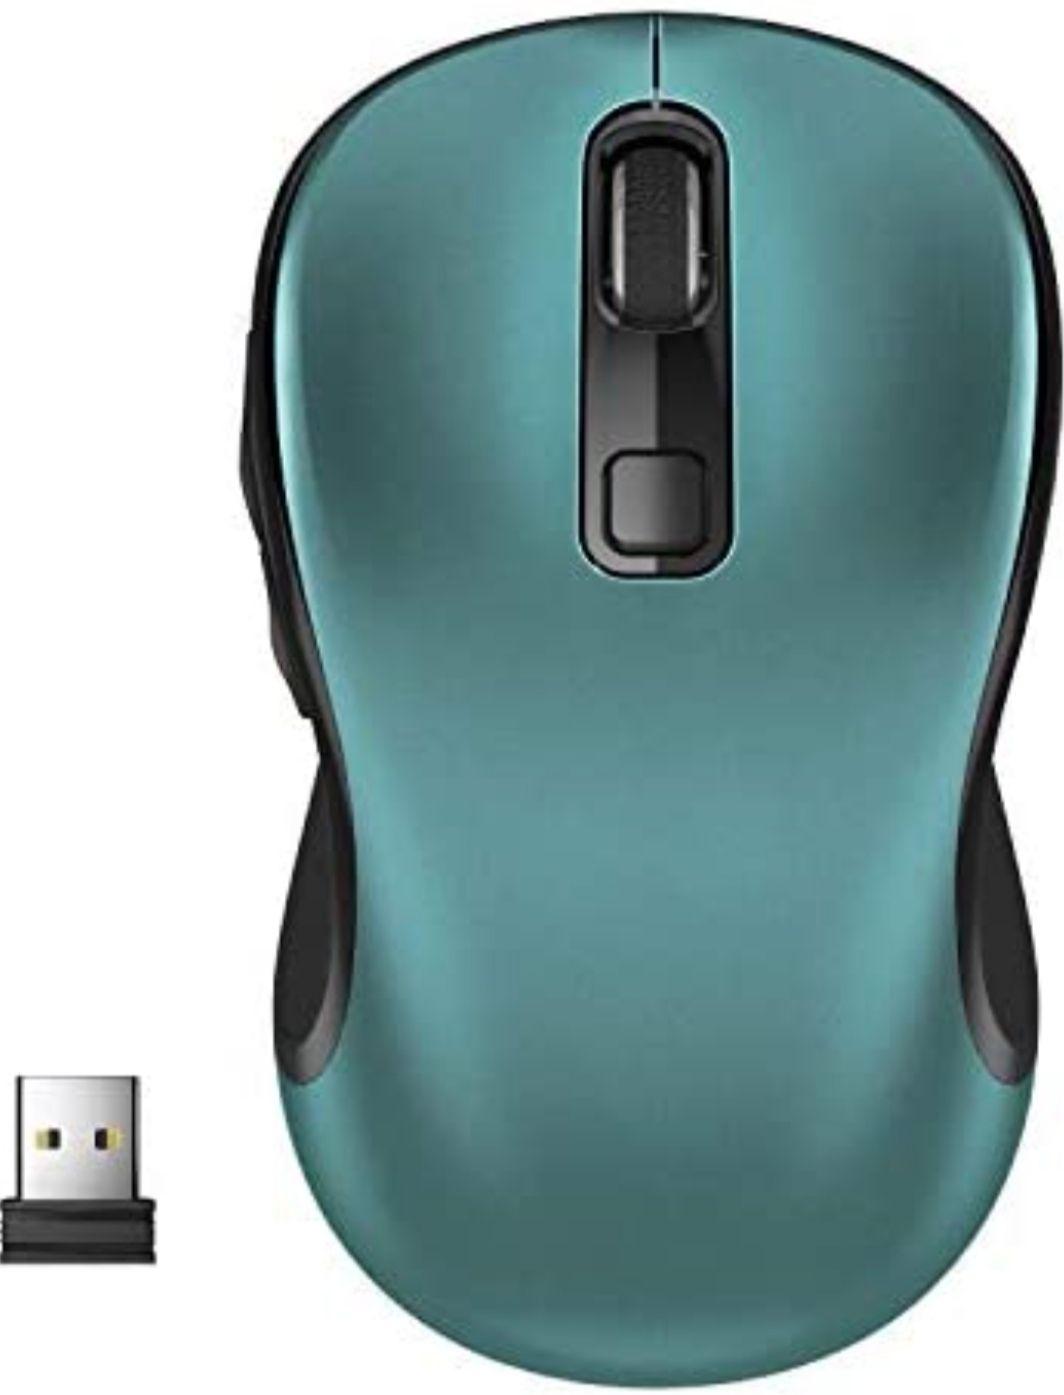 WisFox Ratón Inalambrico, 2.4G Ergonómico Antideslizante [Varios Colores]